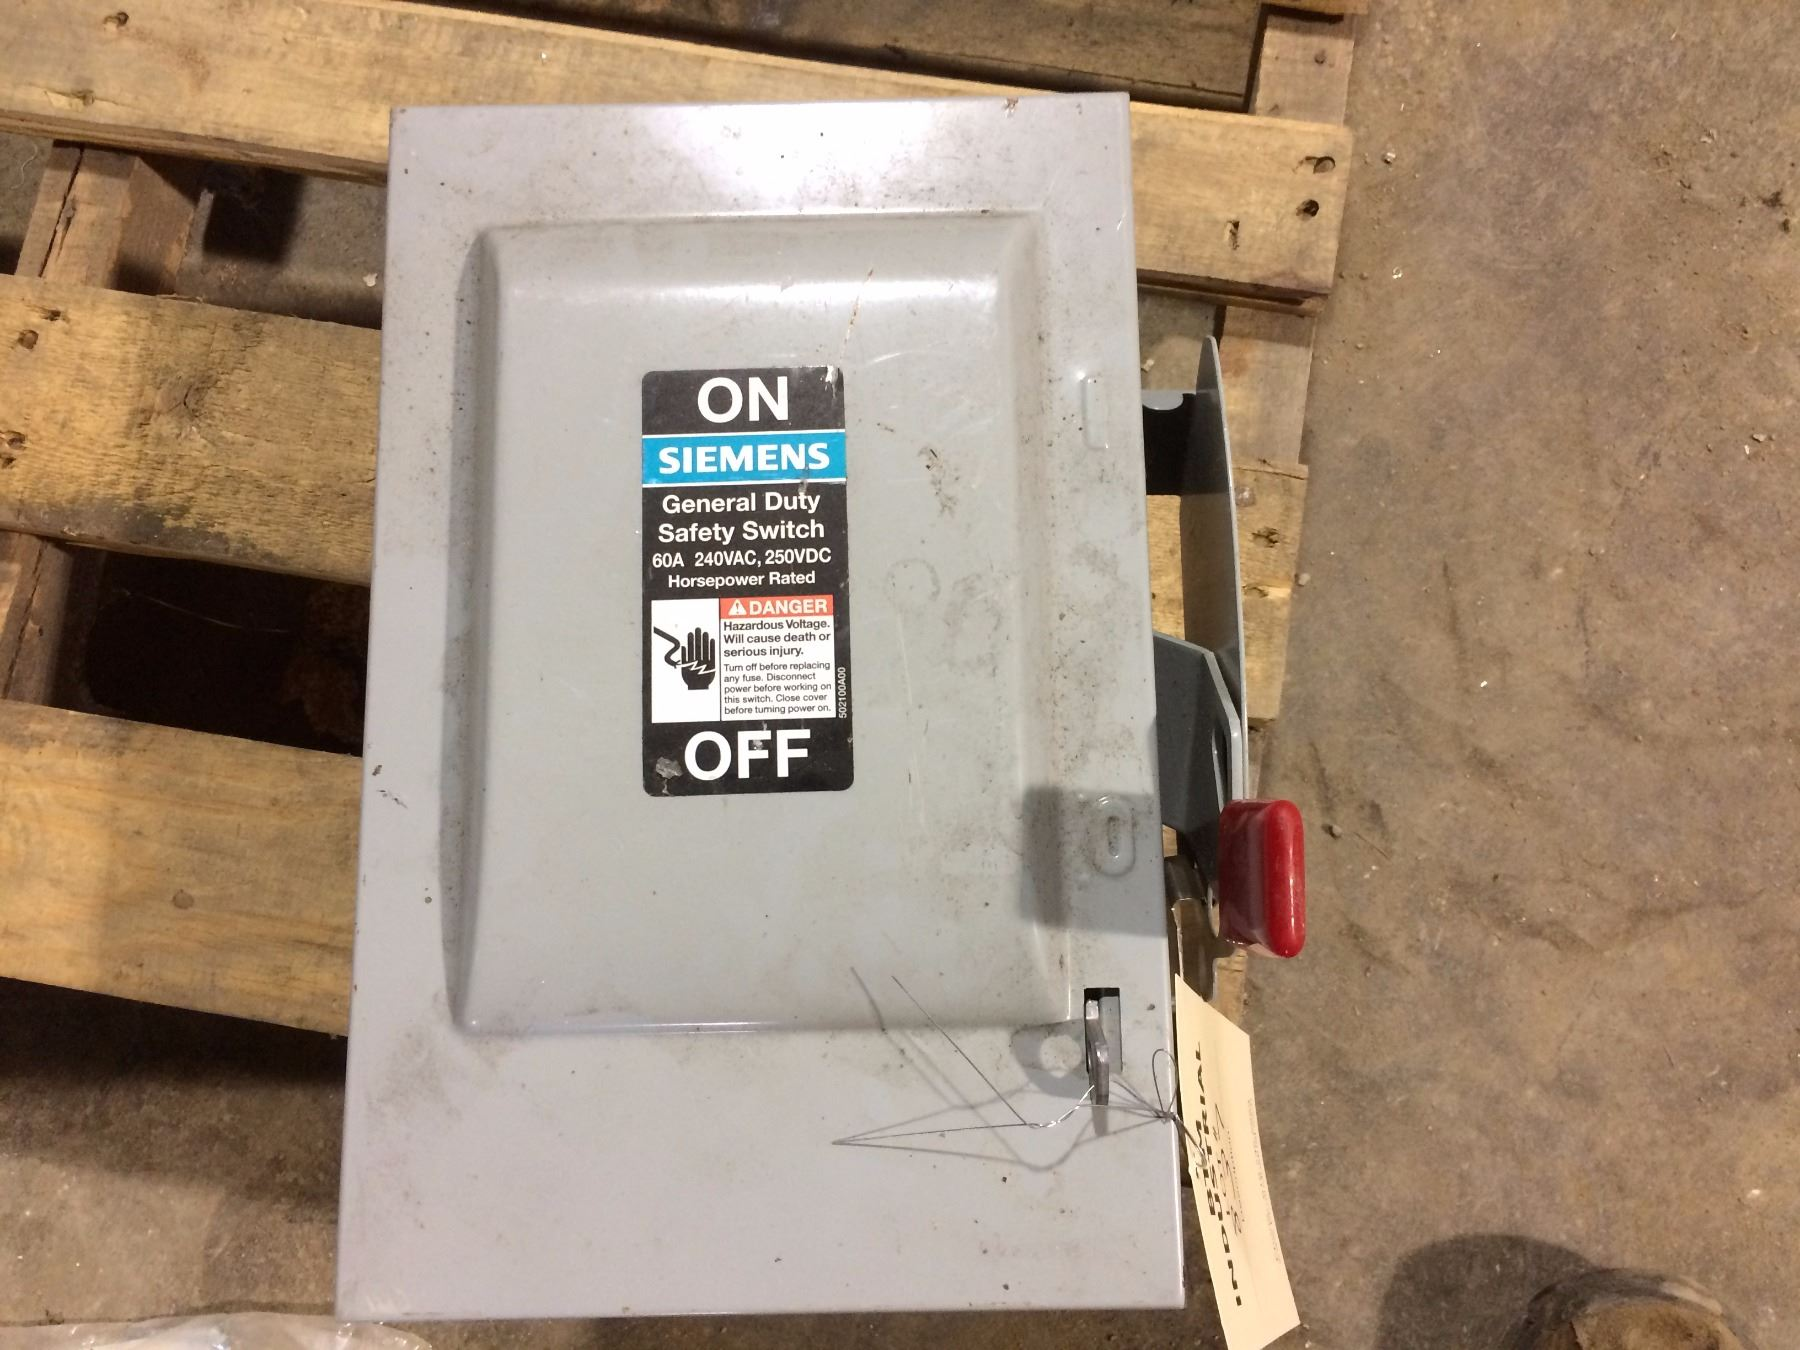 image 1 : siemens general duty safety switch 60 amp 240 vac 250 dc box